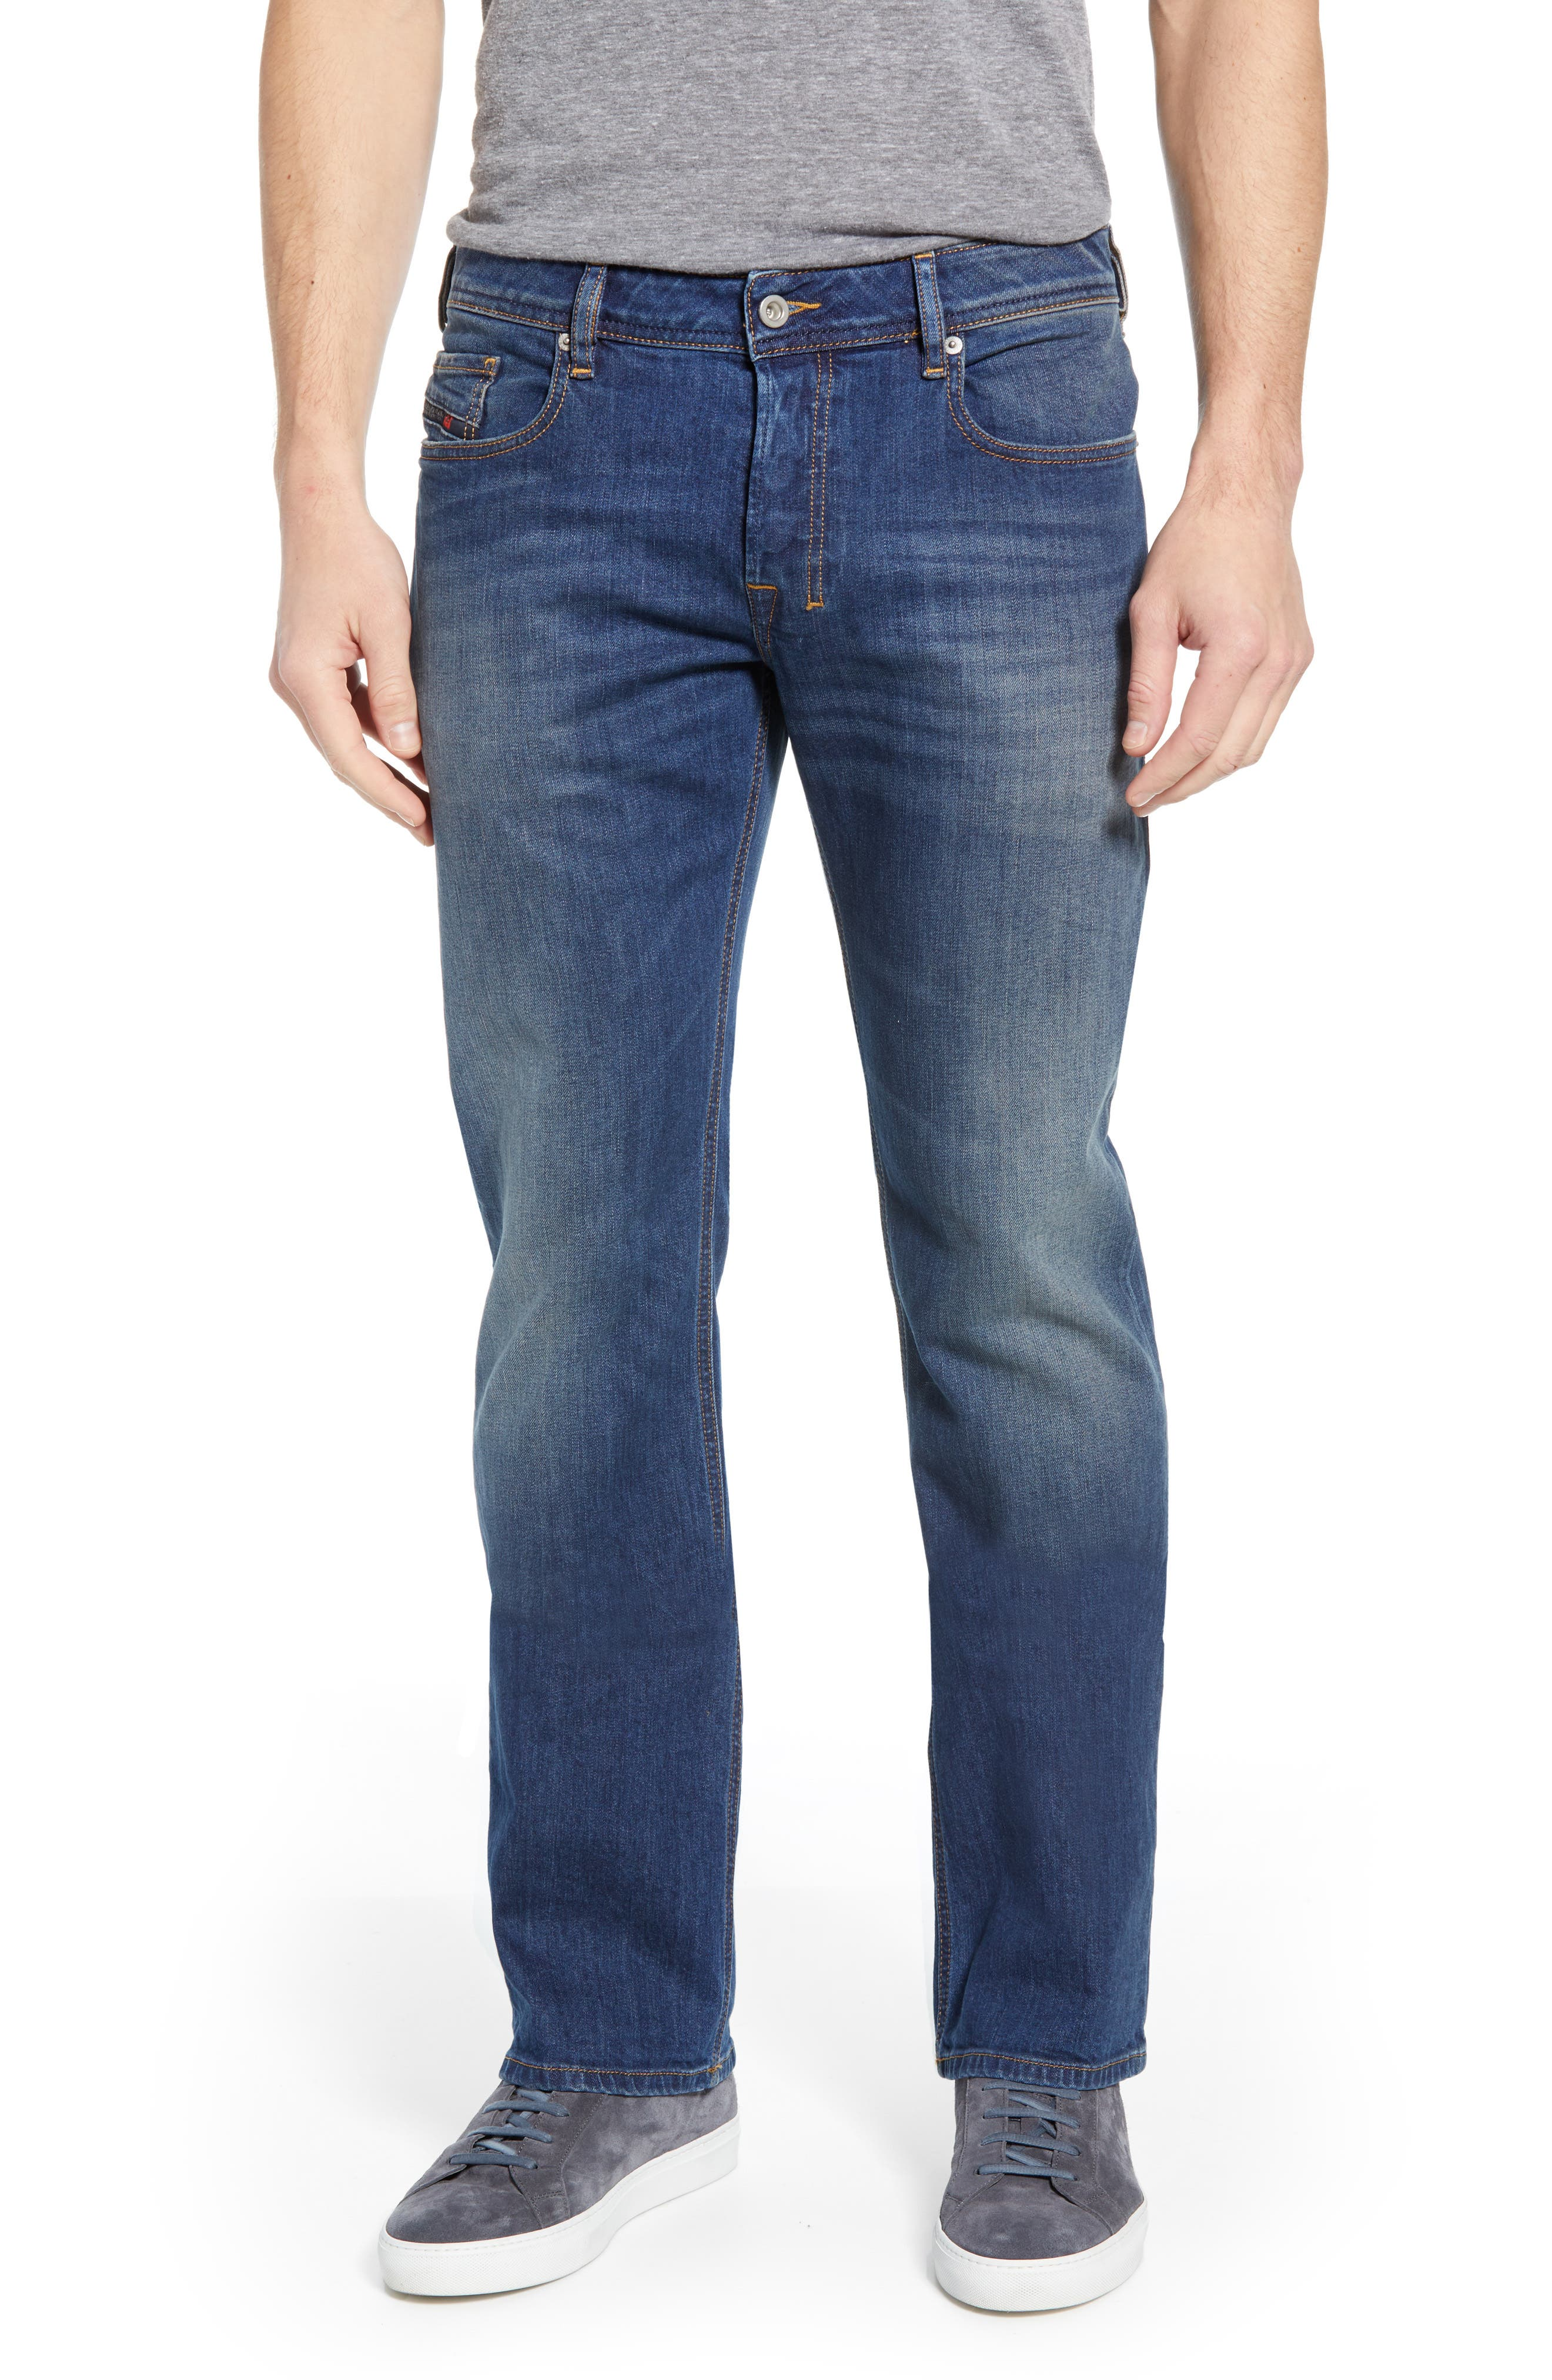 DIESEL<SUP>®</SUP>, Zatiny Bootcut Jeans, Main thumbnail 1, color, DENIM